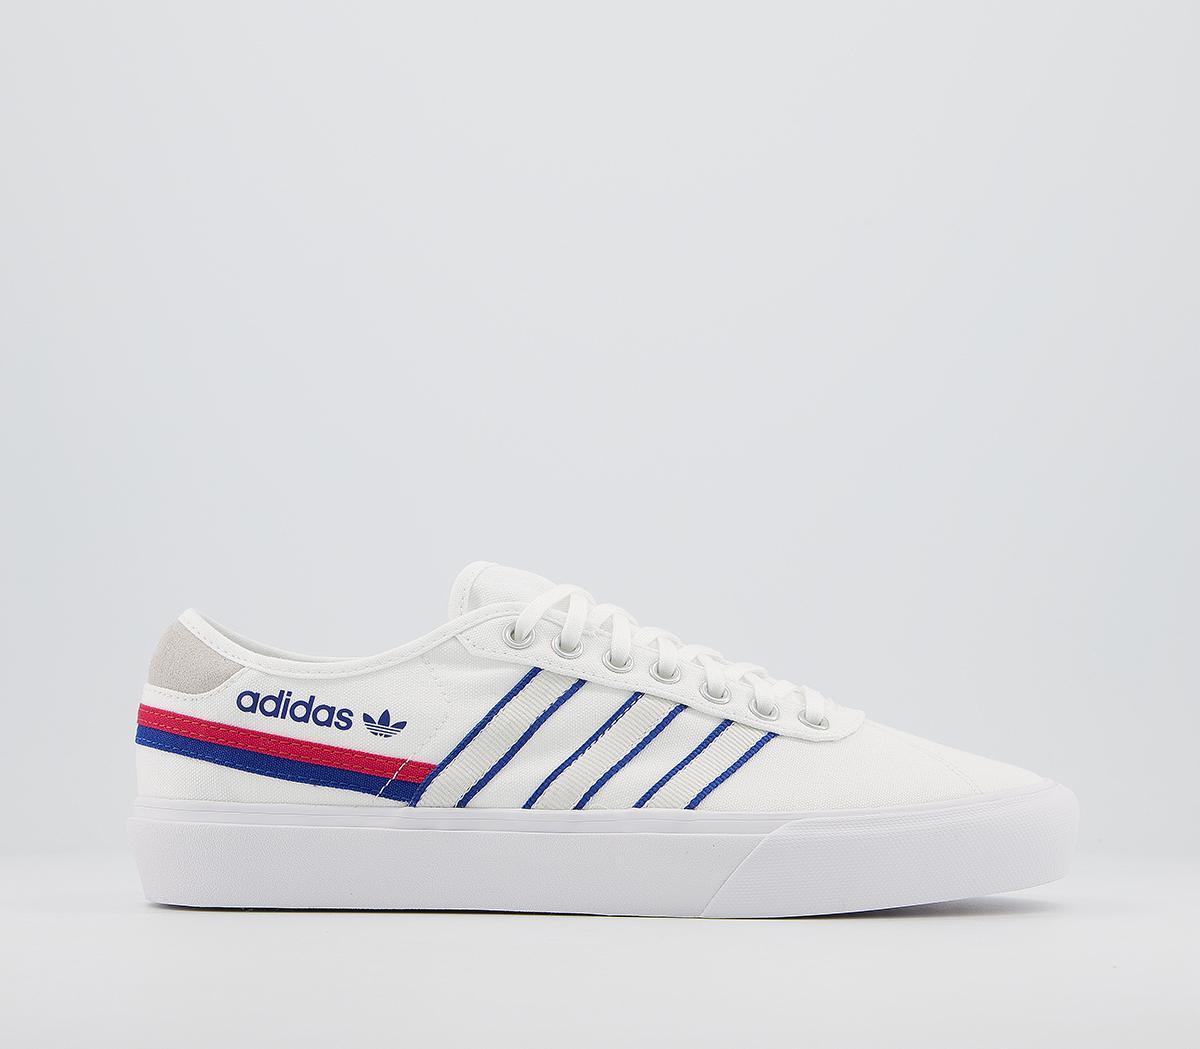 adidas Delpala Trainers White Royal